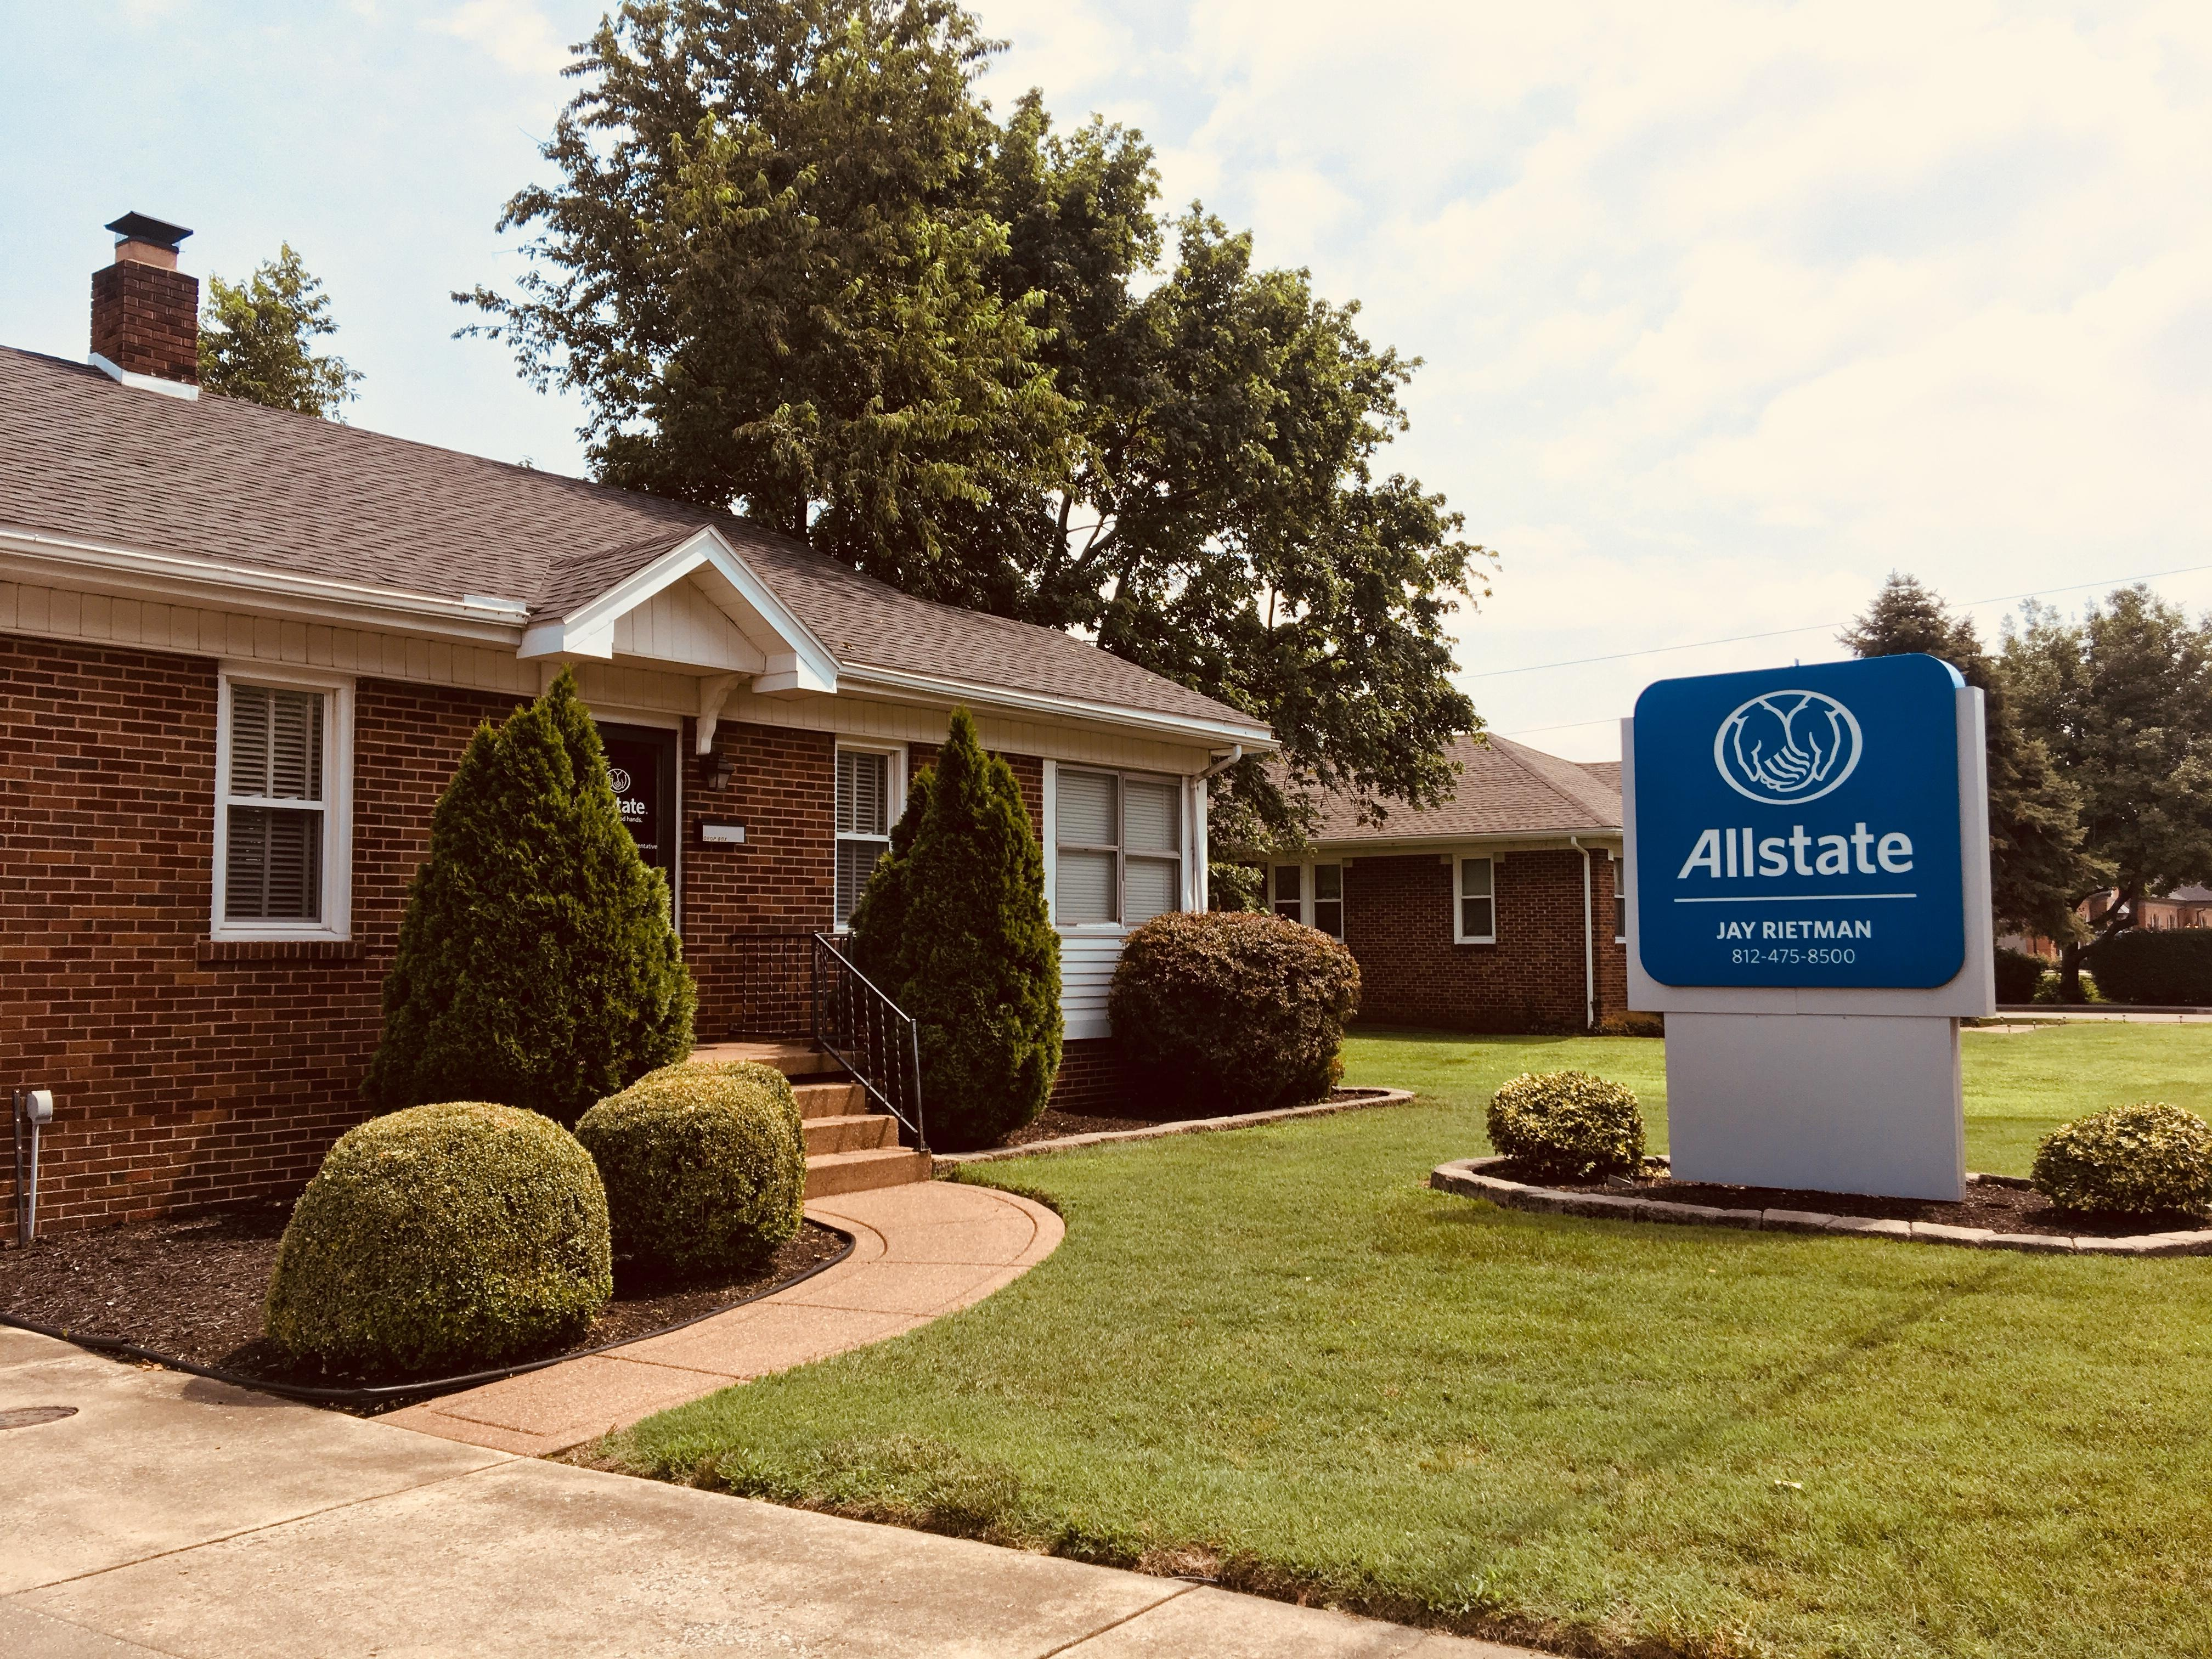 Jay Rietman: Allstate Insurance image 2